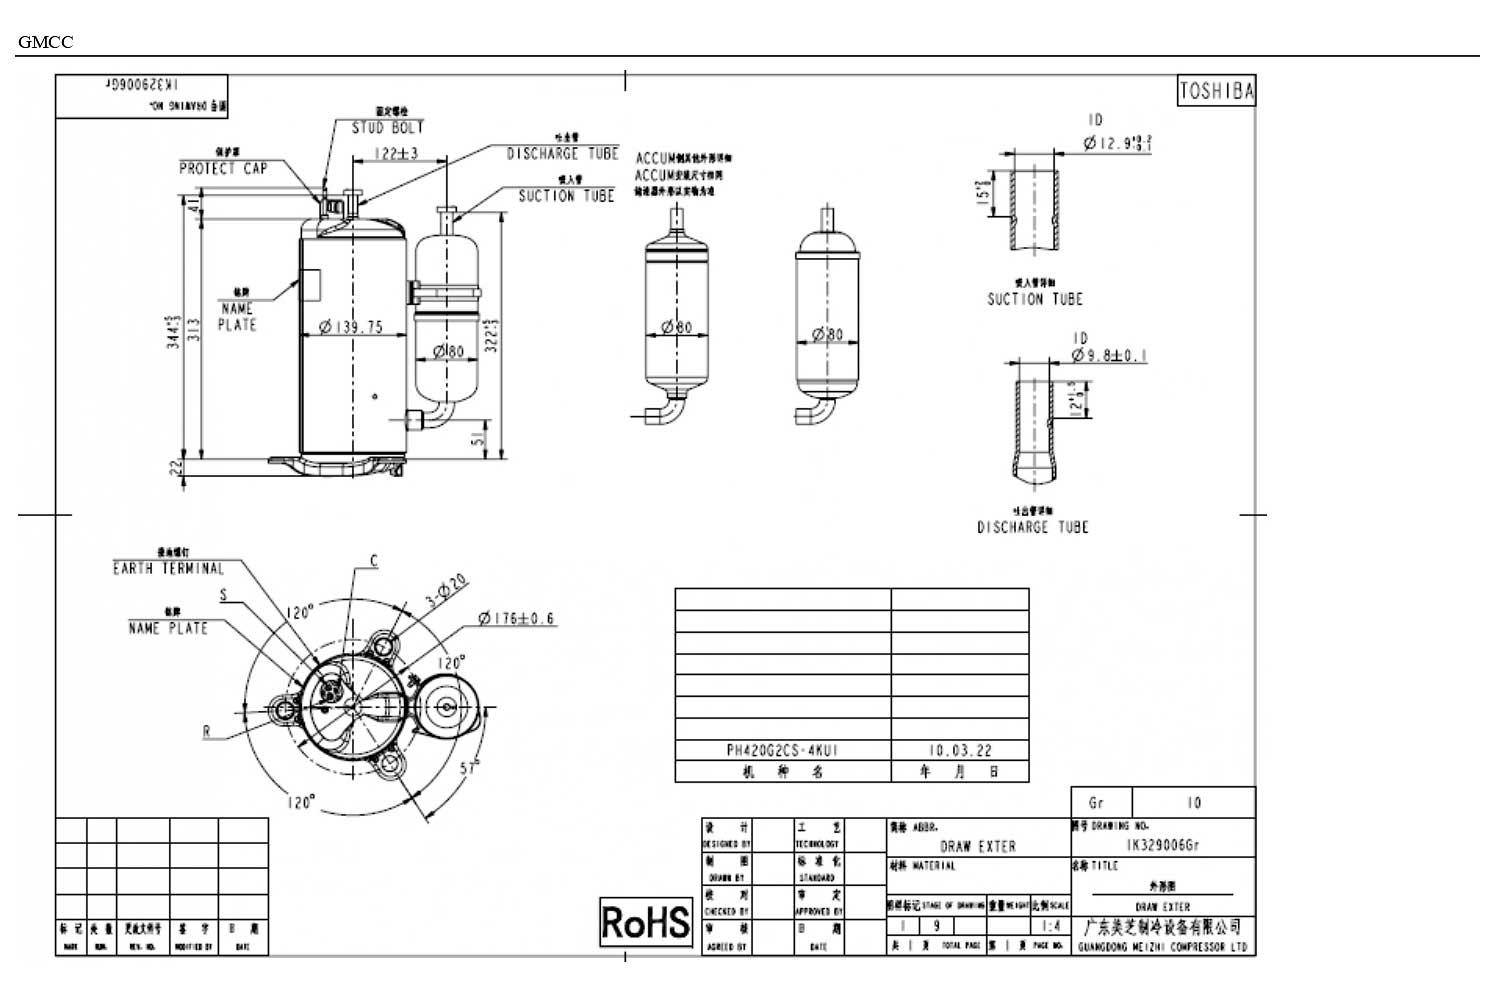 GMCC PH420G2CS-4KU1 характеристики